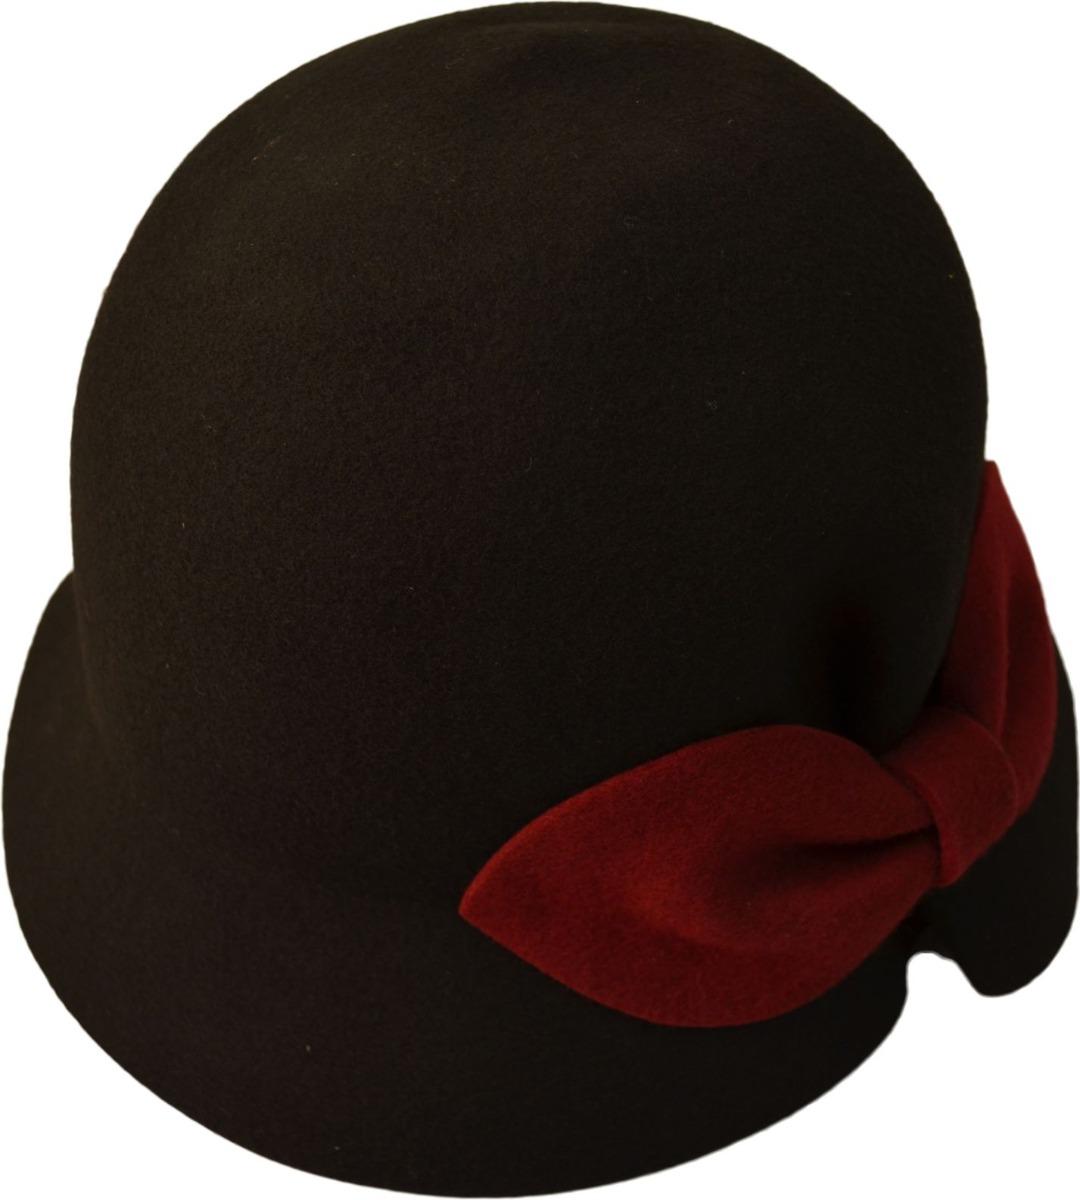 eae2399br_chapeau-cloche-pin-up-40-s-50-s-retro-glamour-chic-laine